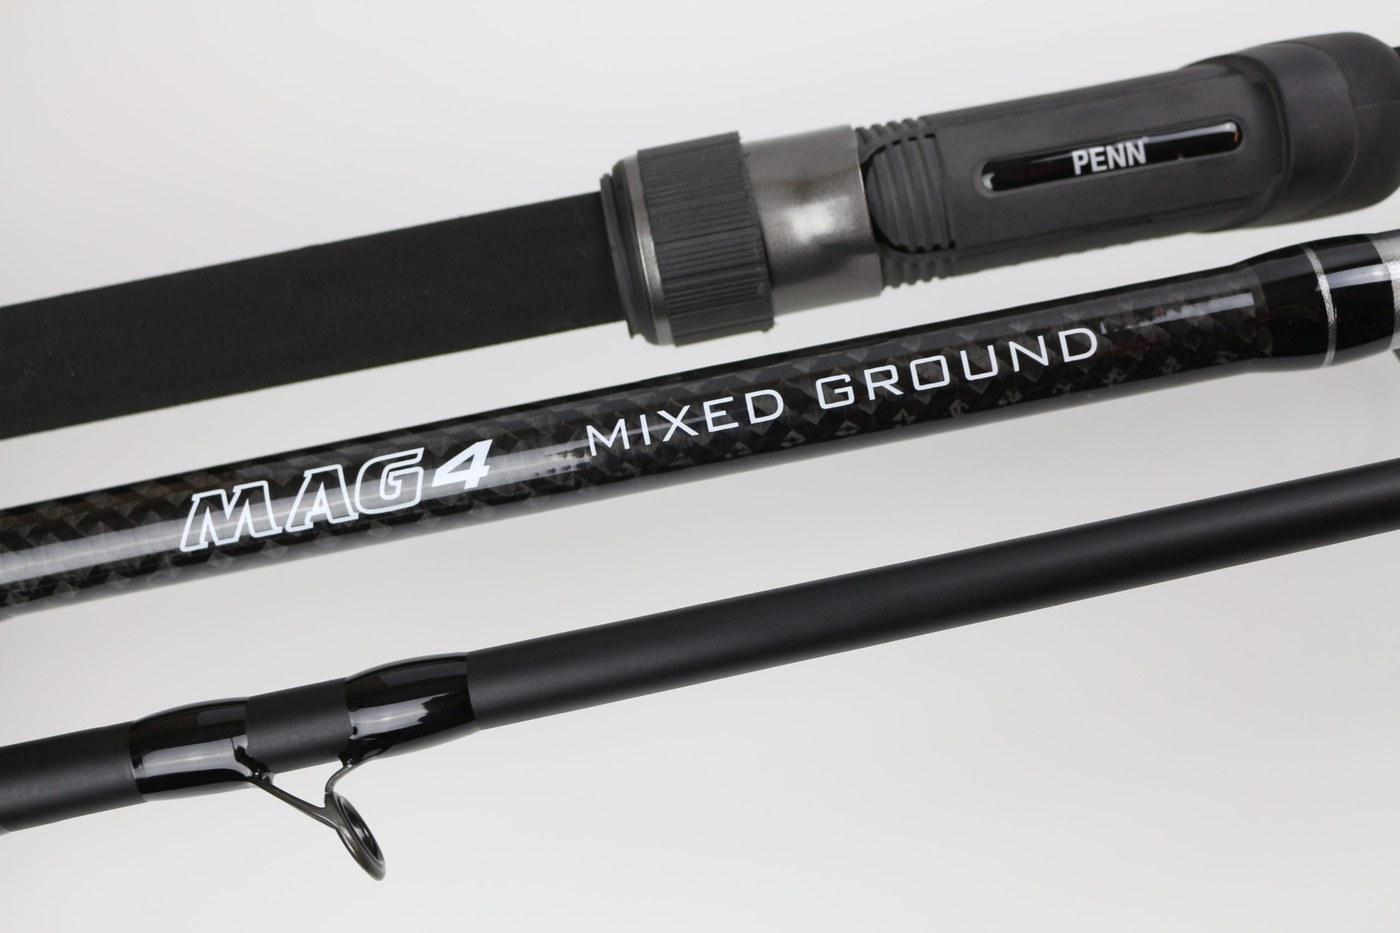 Penn Mag4 Mixed Ground